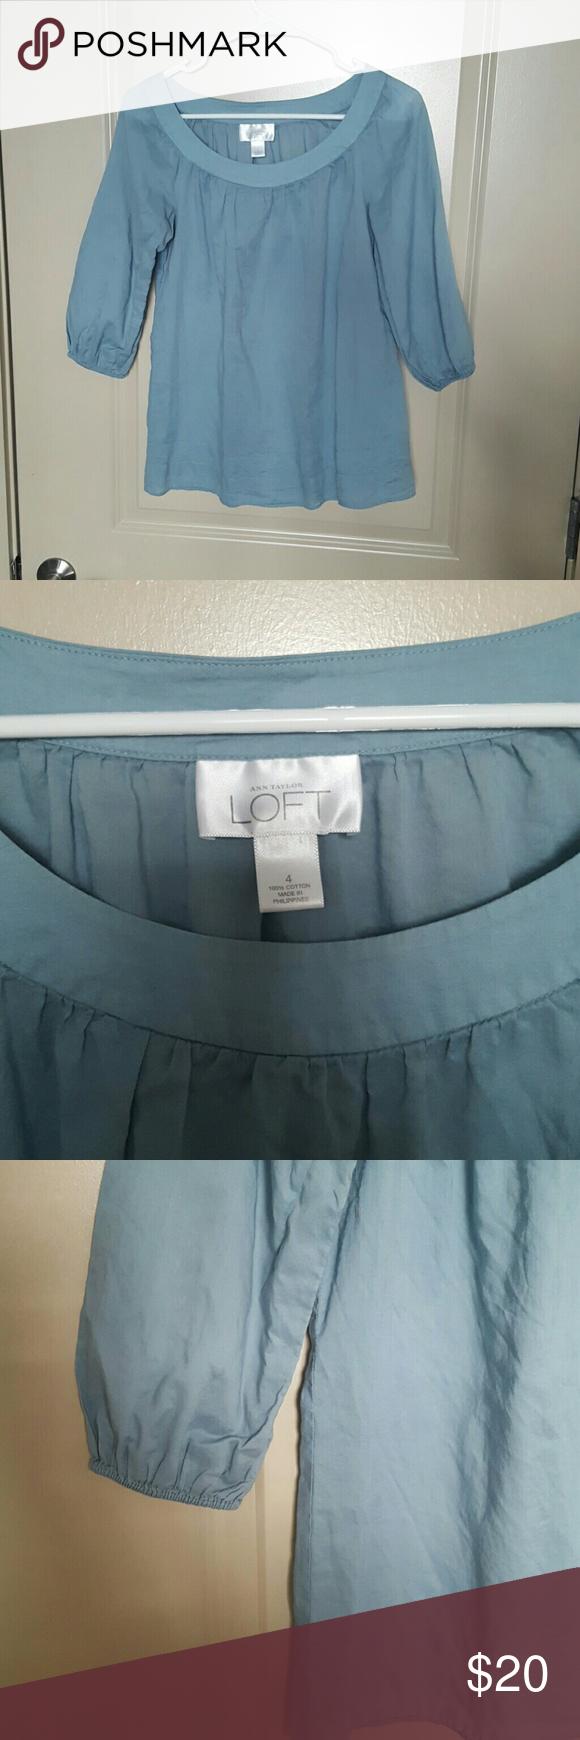 Selling this LOFT cotton blouse on Poshmark! My username is: buckleboots. #shopmycloset #poshmark #fashion #shopping #style #forsale #LOFT #Tops